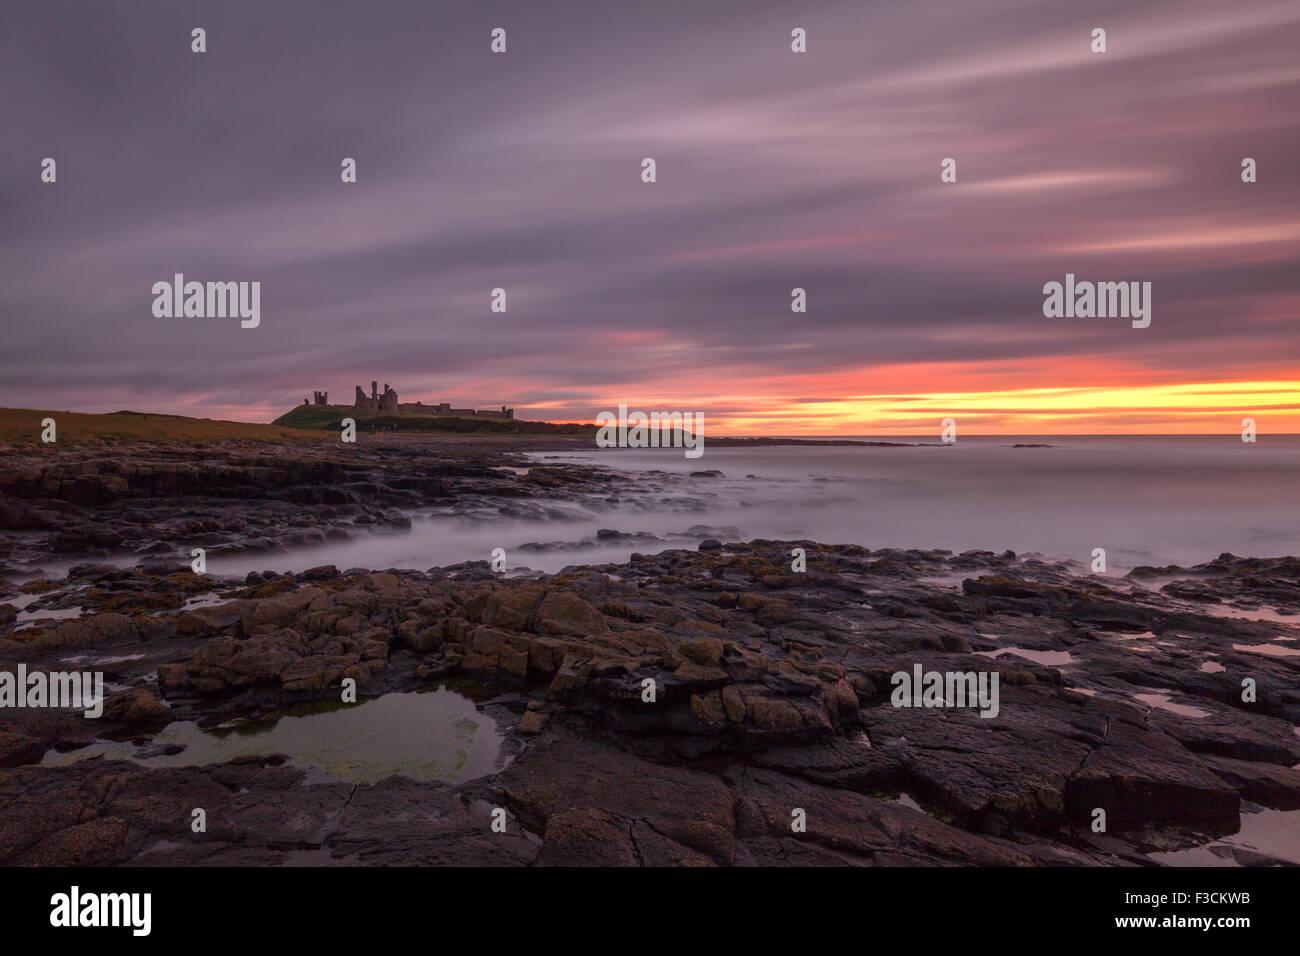 Dunstanburgh Castle im Morgengrauen, mit Blick auf die felsige Küste, Northumberland, UK Stockbild